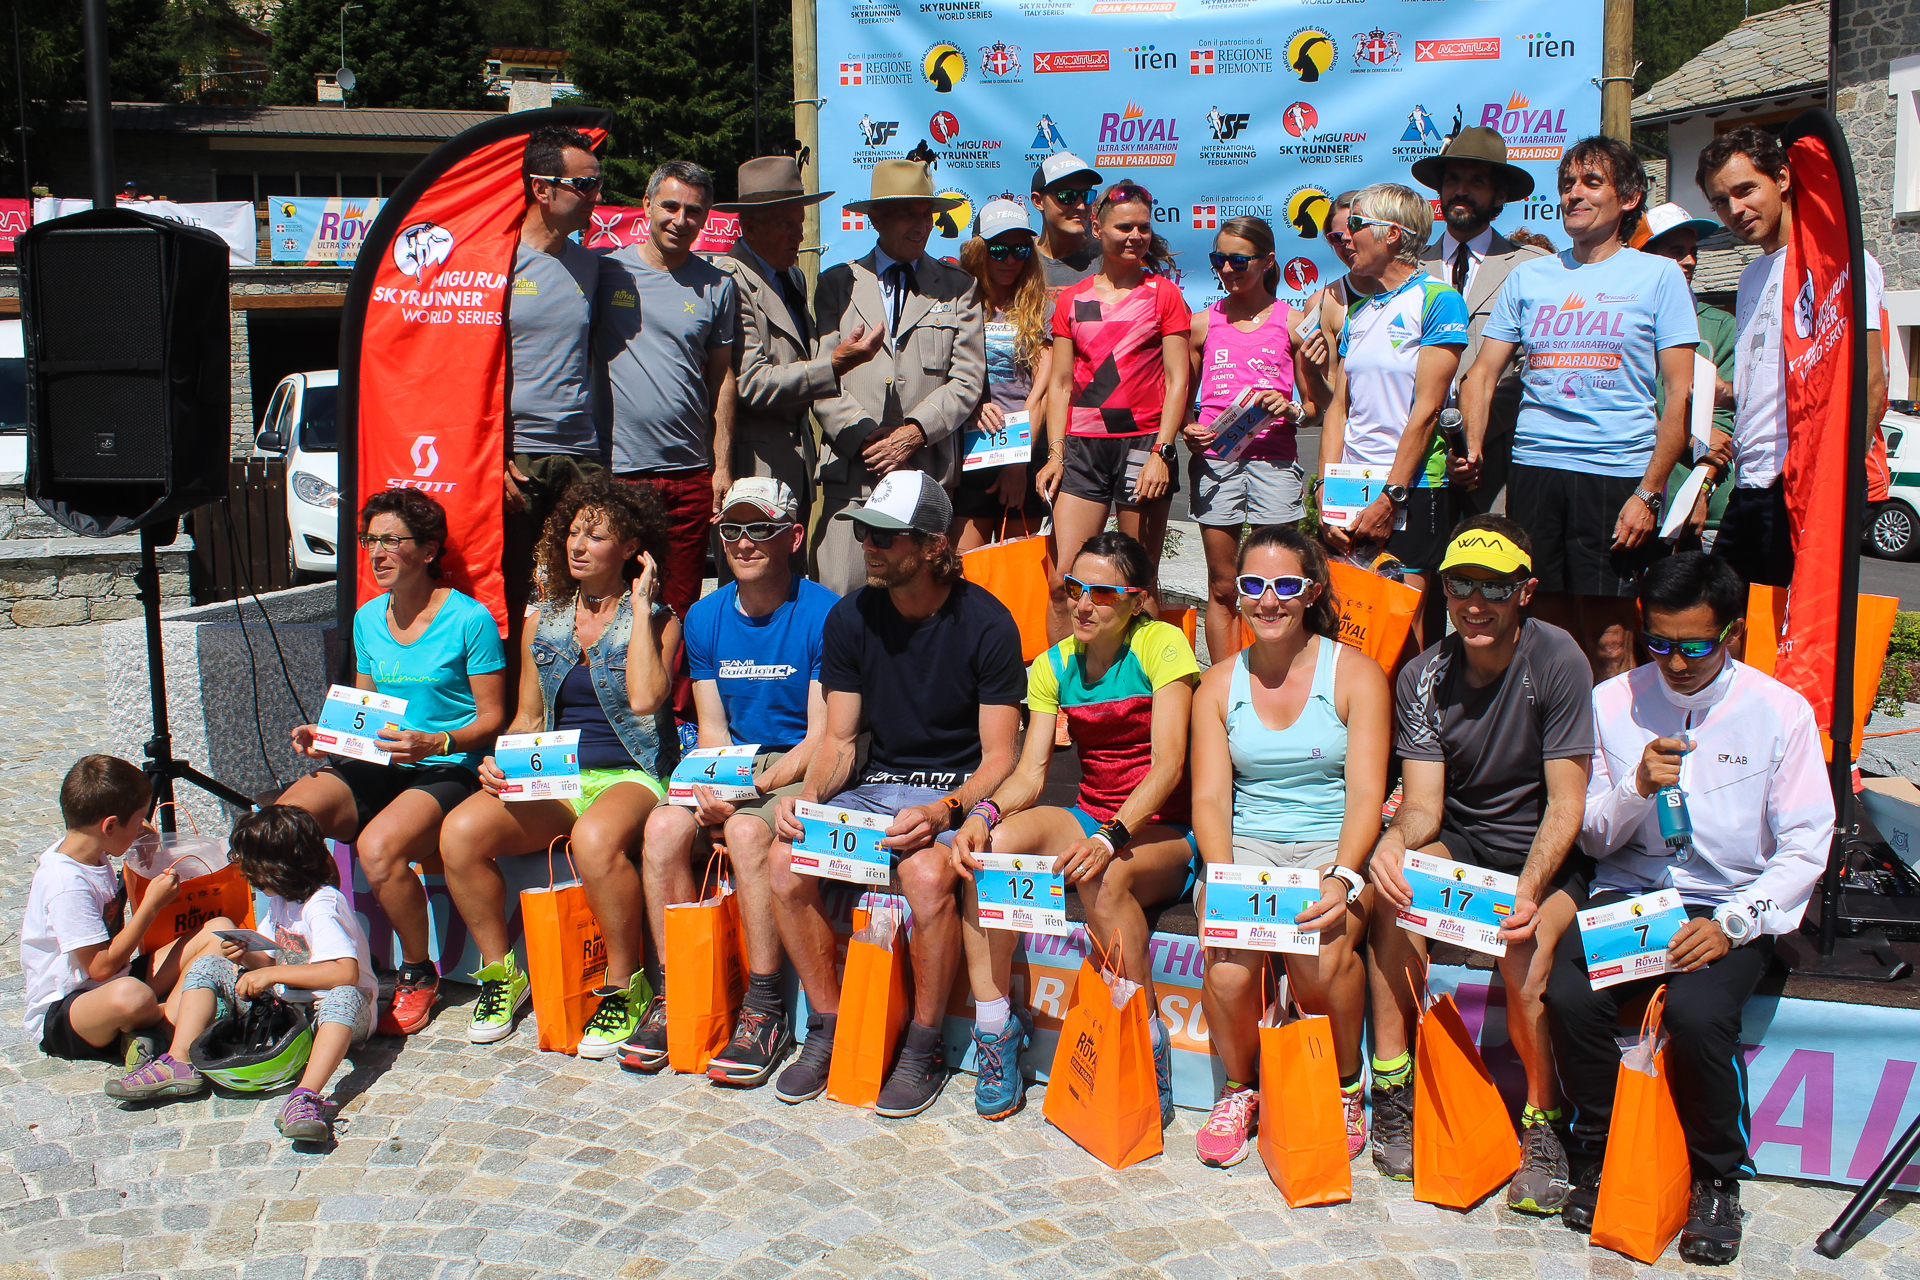 Royal Ultra Skymarathon Gran Paradiso. Wręczanie numerówRoyal Ultra Skymarathon Gran Paradiso. Wręczanie numerów